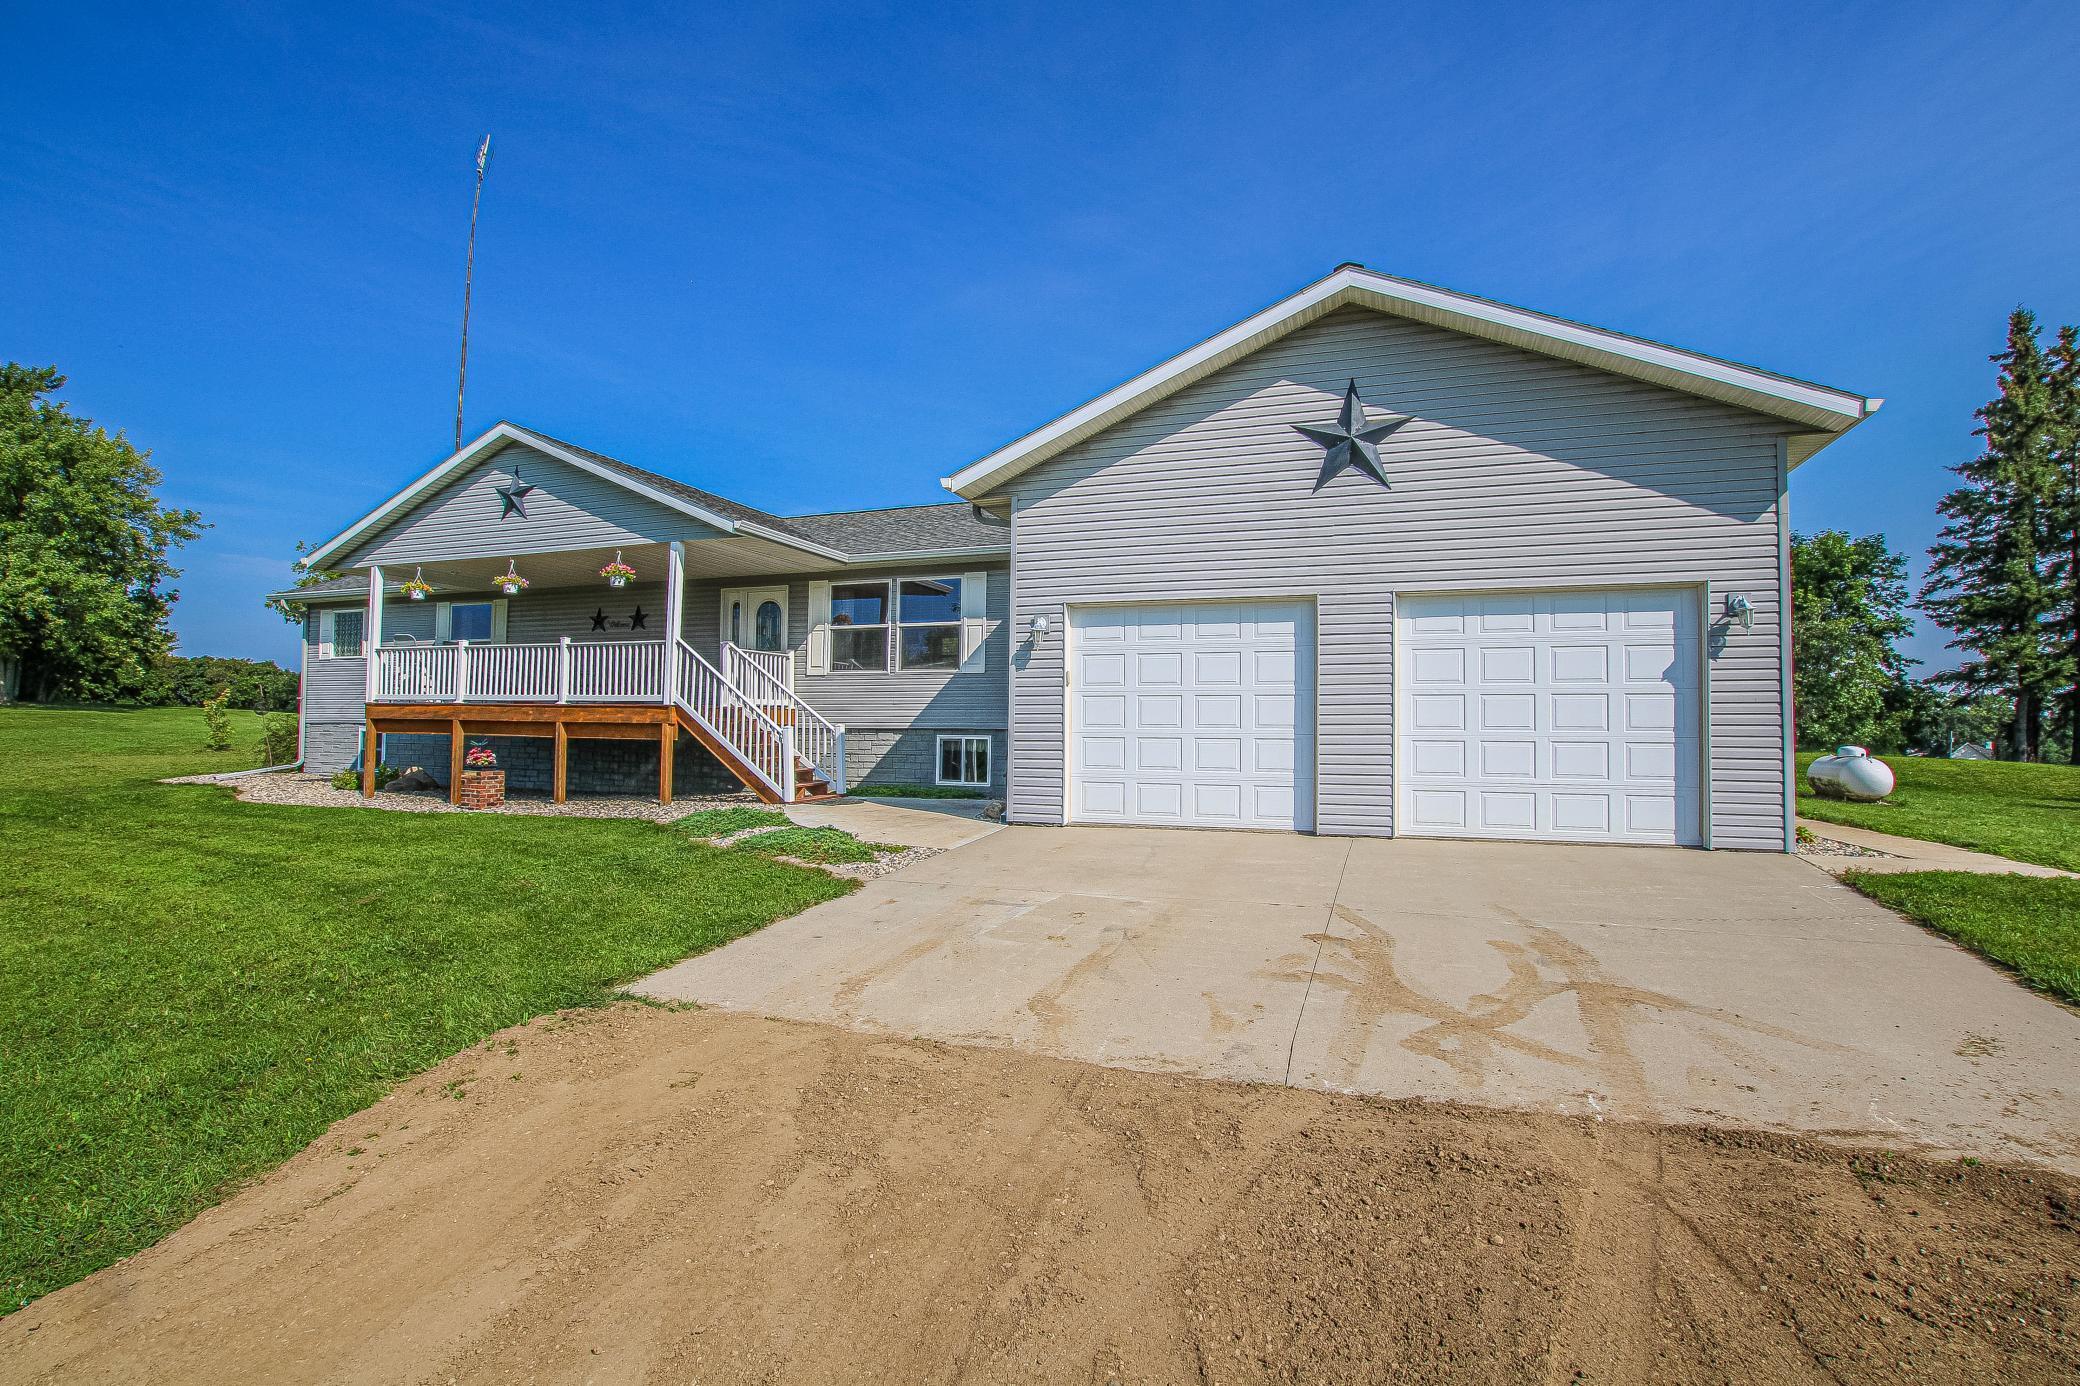 16844 W Miltona Road NE Property Photo - Miltona, MN real estate listing